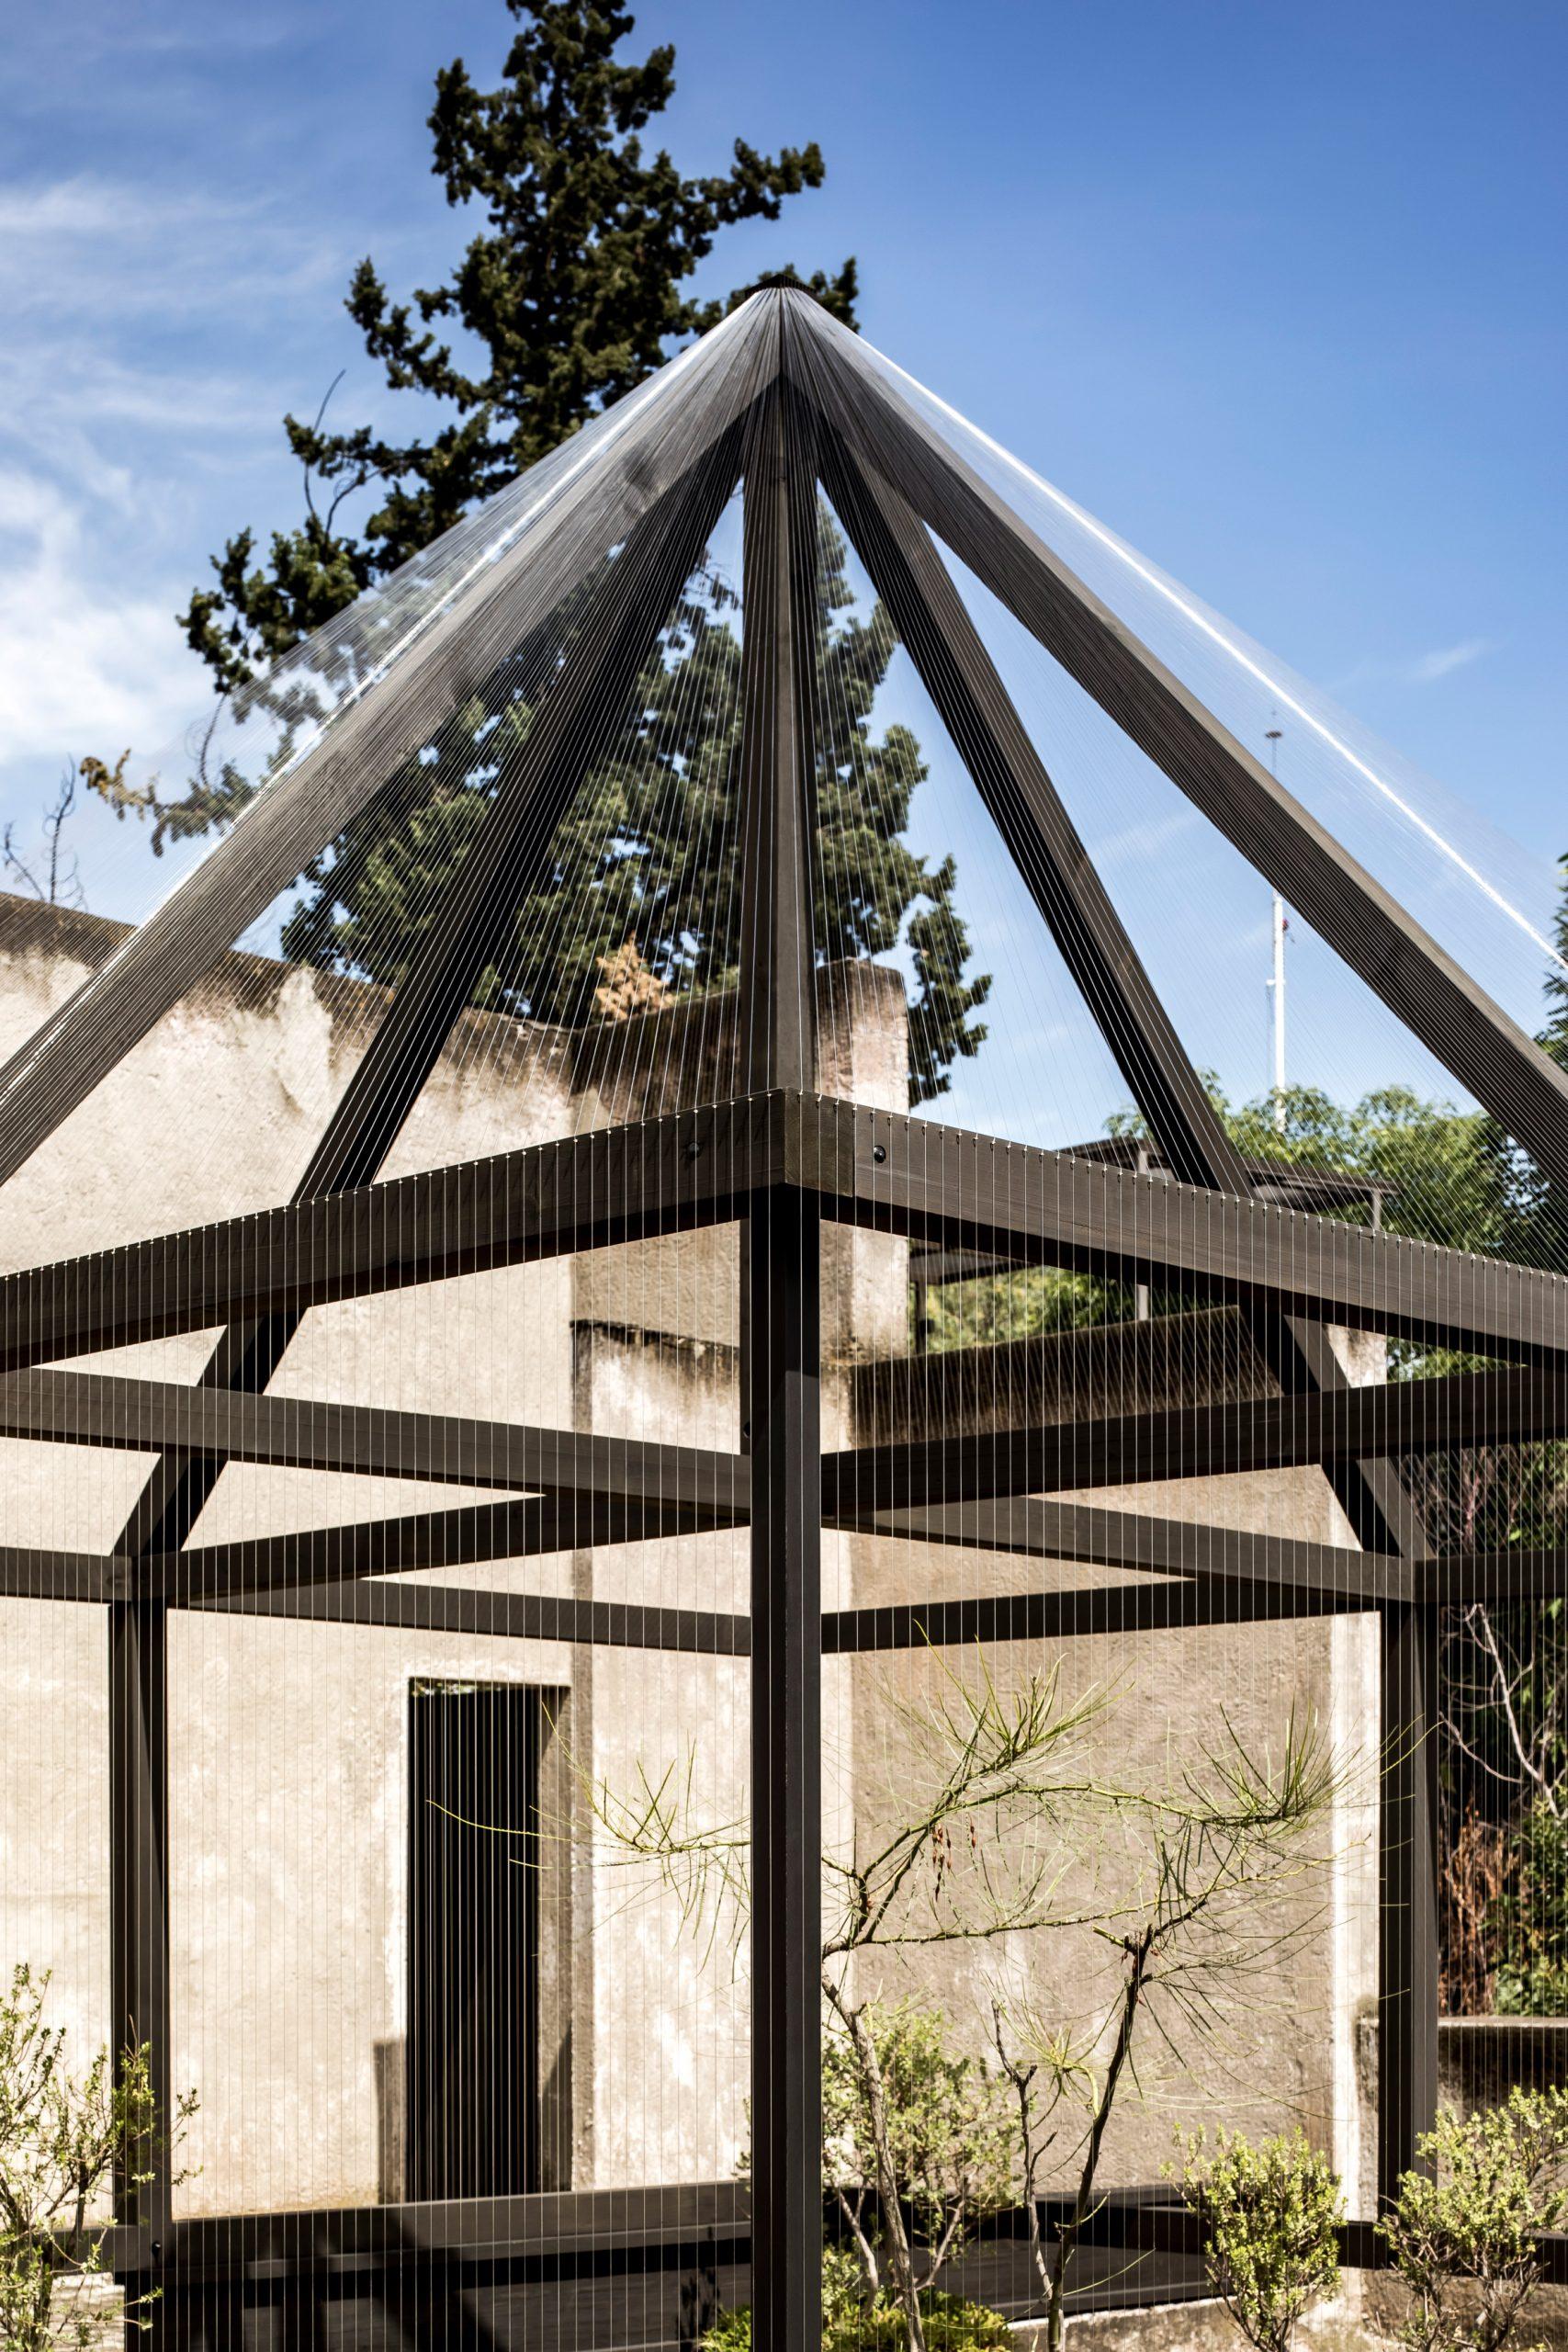 Chapel for Luis Barragán by Robert Hutchison Architecture